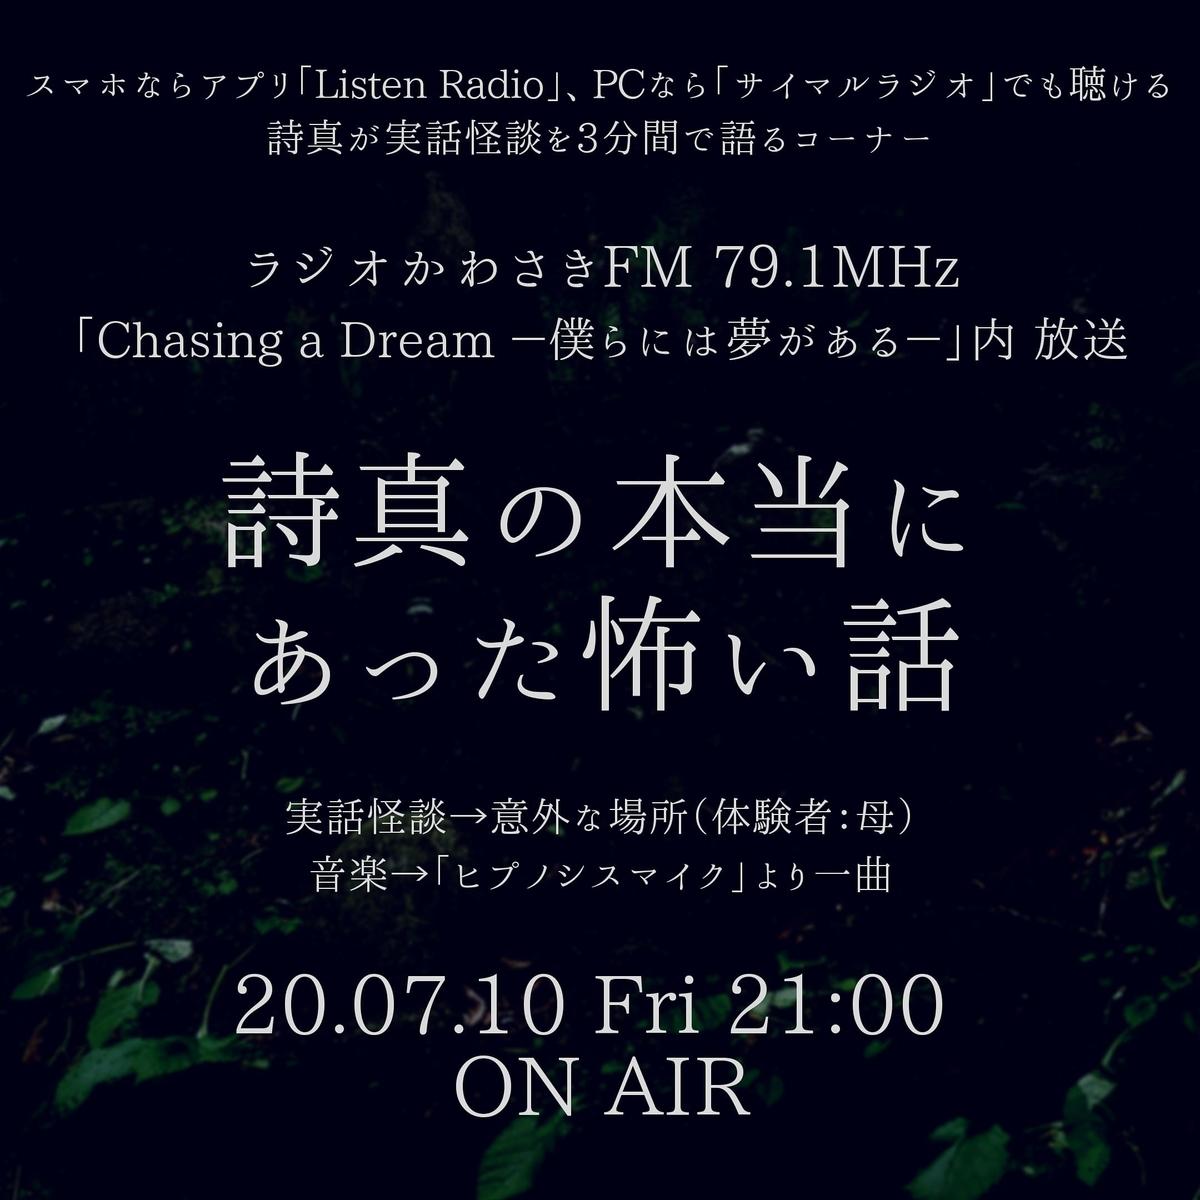 f:id:yukaitekietsu:20200709233245j:plain